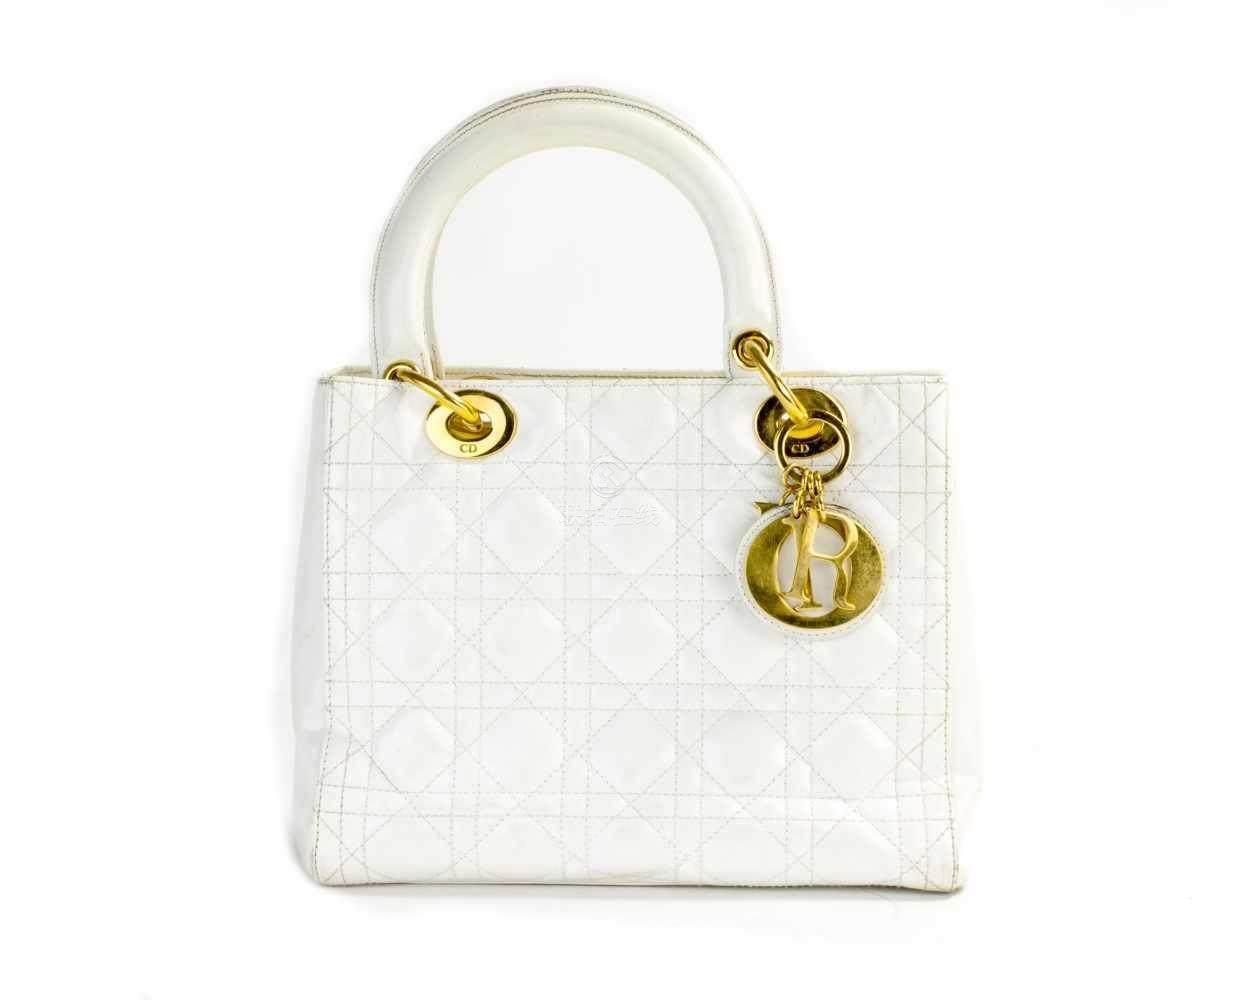 0f00caab51d7c 51BidLive-  Christian Dior  Lady Dior  Handtasche Frankreich